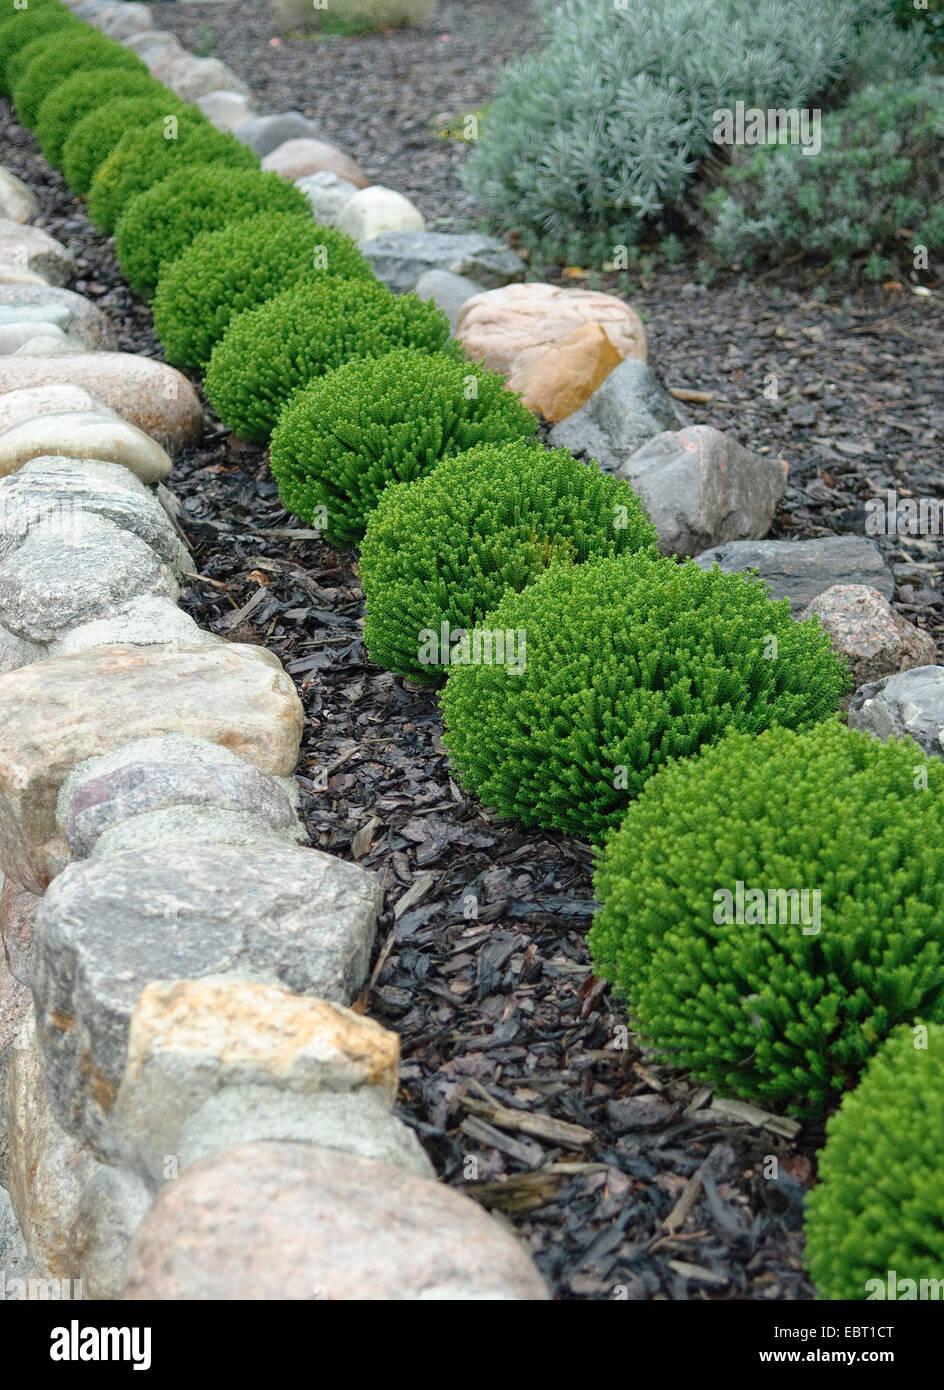 hebe, speedwell (Hebe 'Emerald Gem', Hebe Emerald Gem), cultivar Emerald Gem in a row - Stock Image